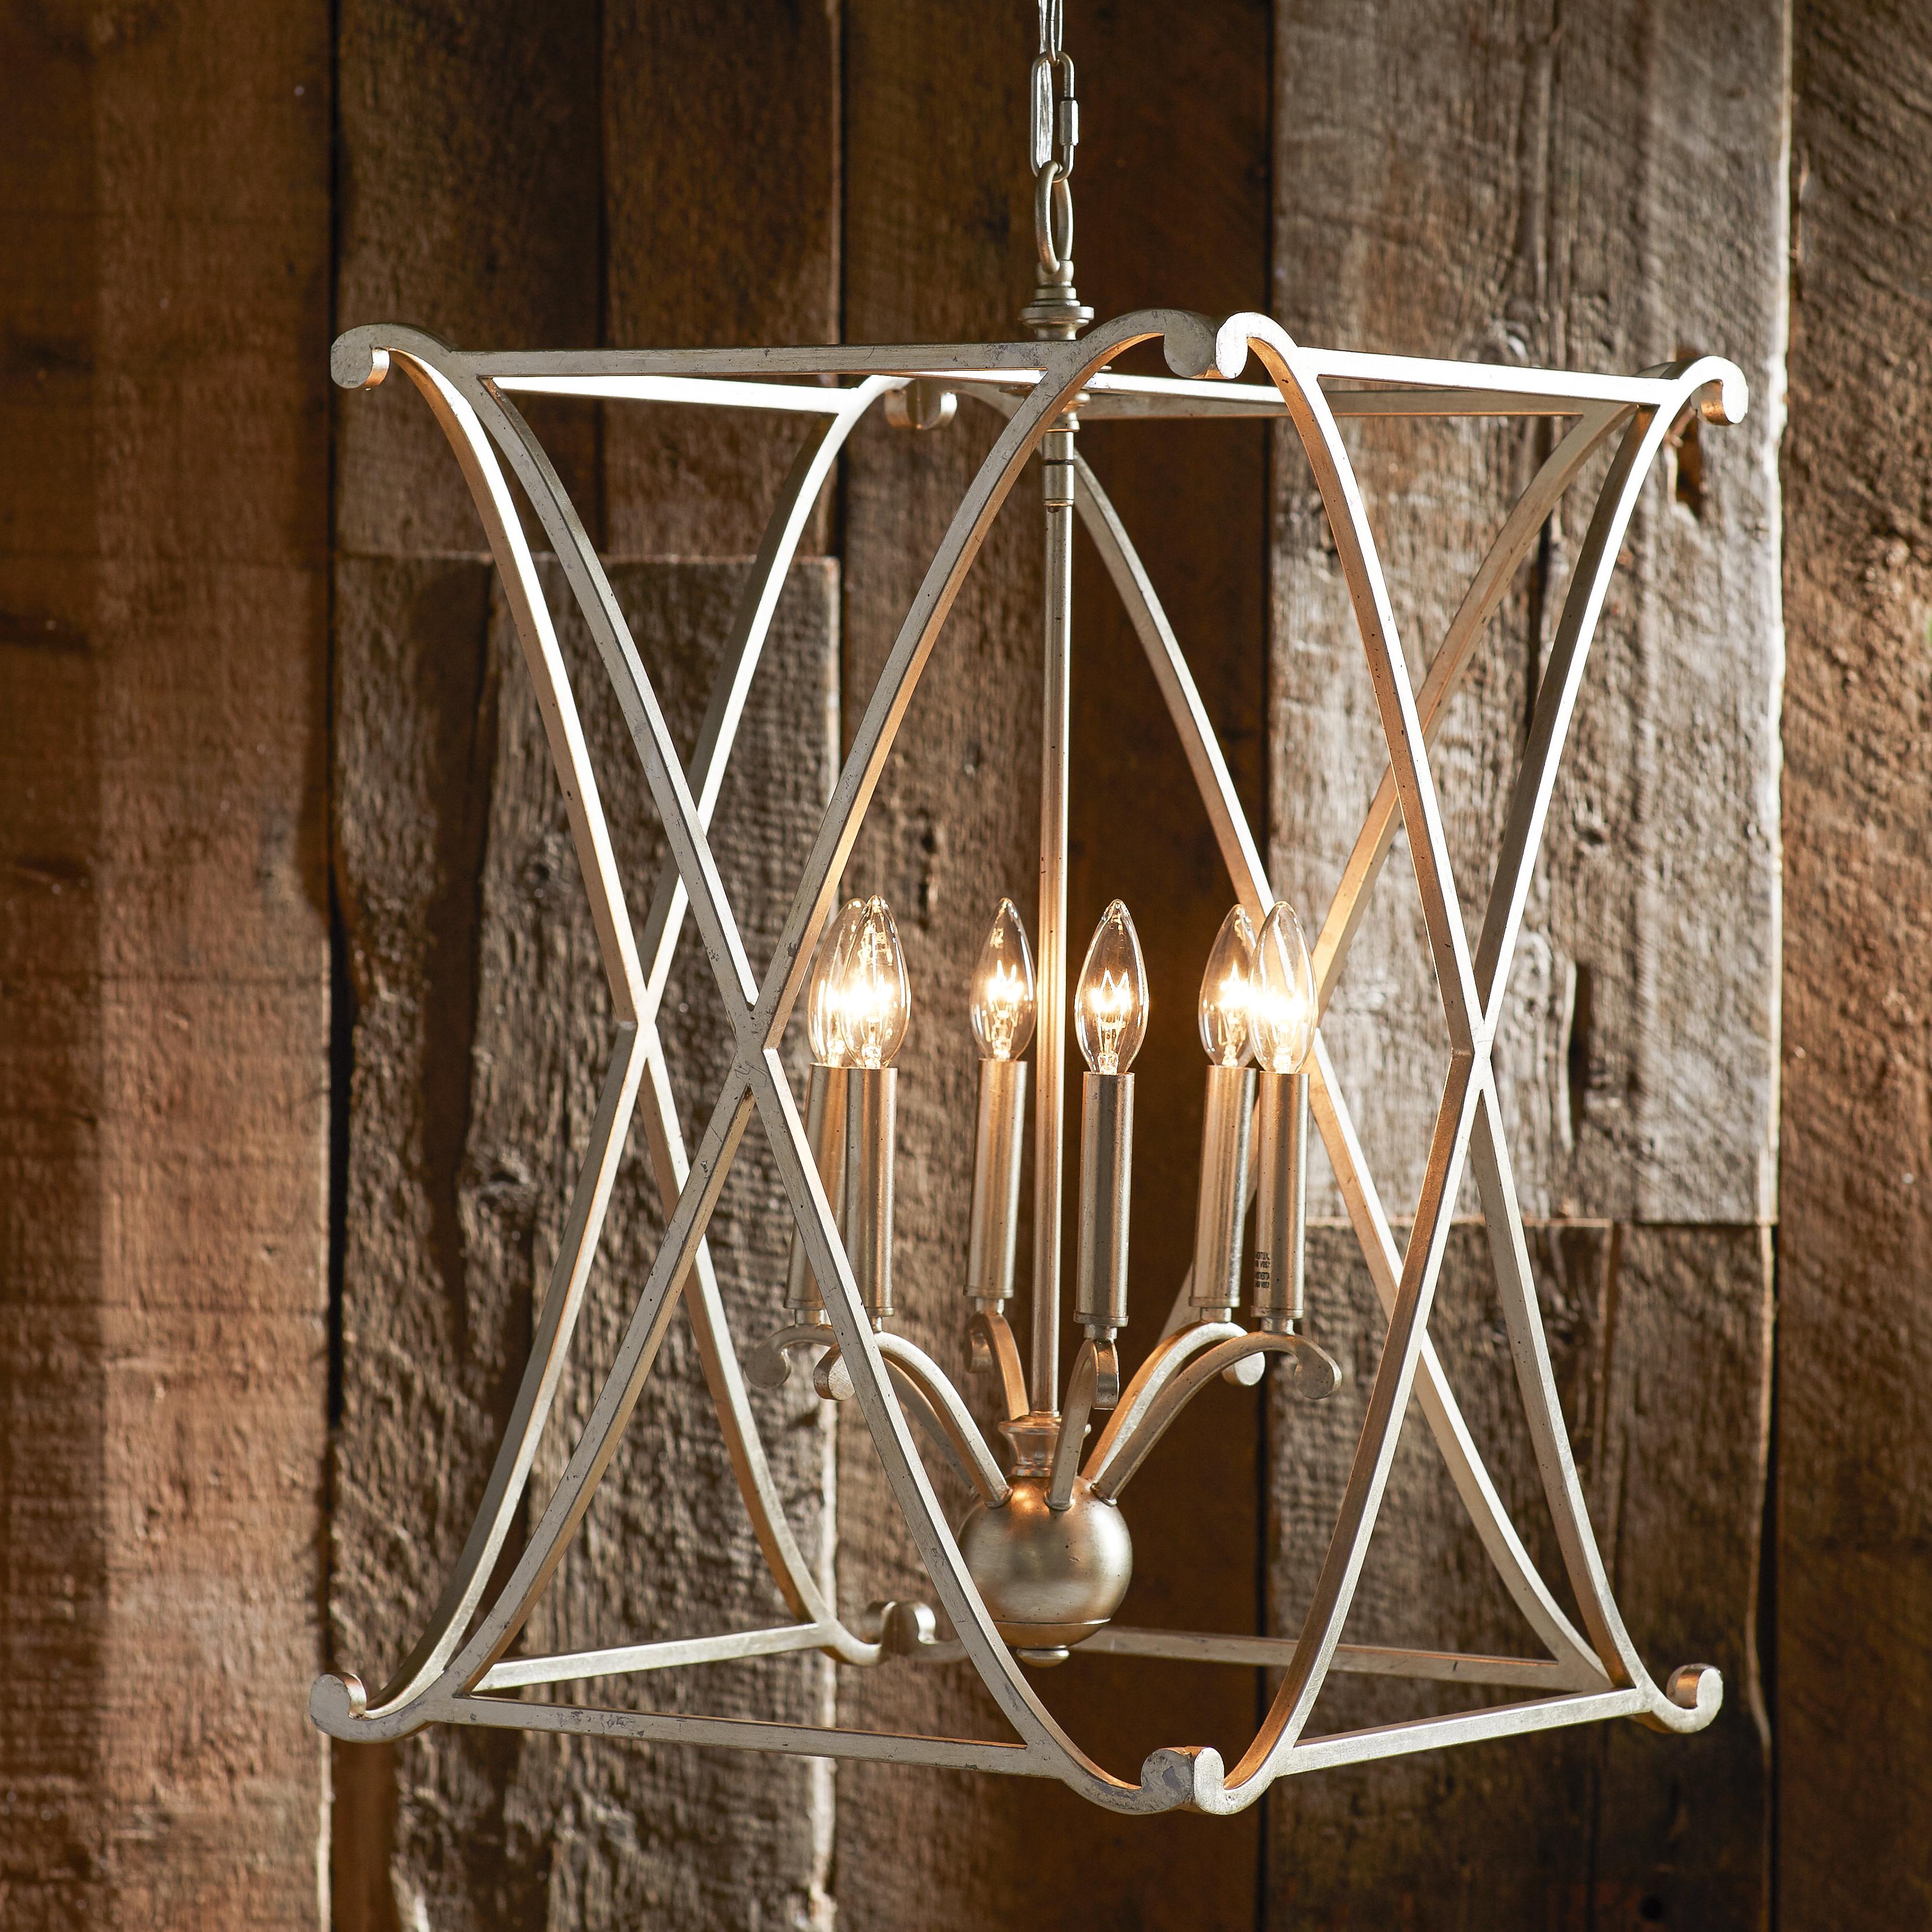 Nisbet 4-Light Lantern Geometric Pendant throughout Popular Nisbet 6-Light Lantern Geometric Pendants